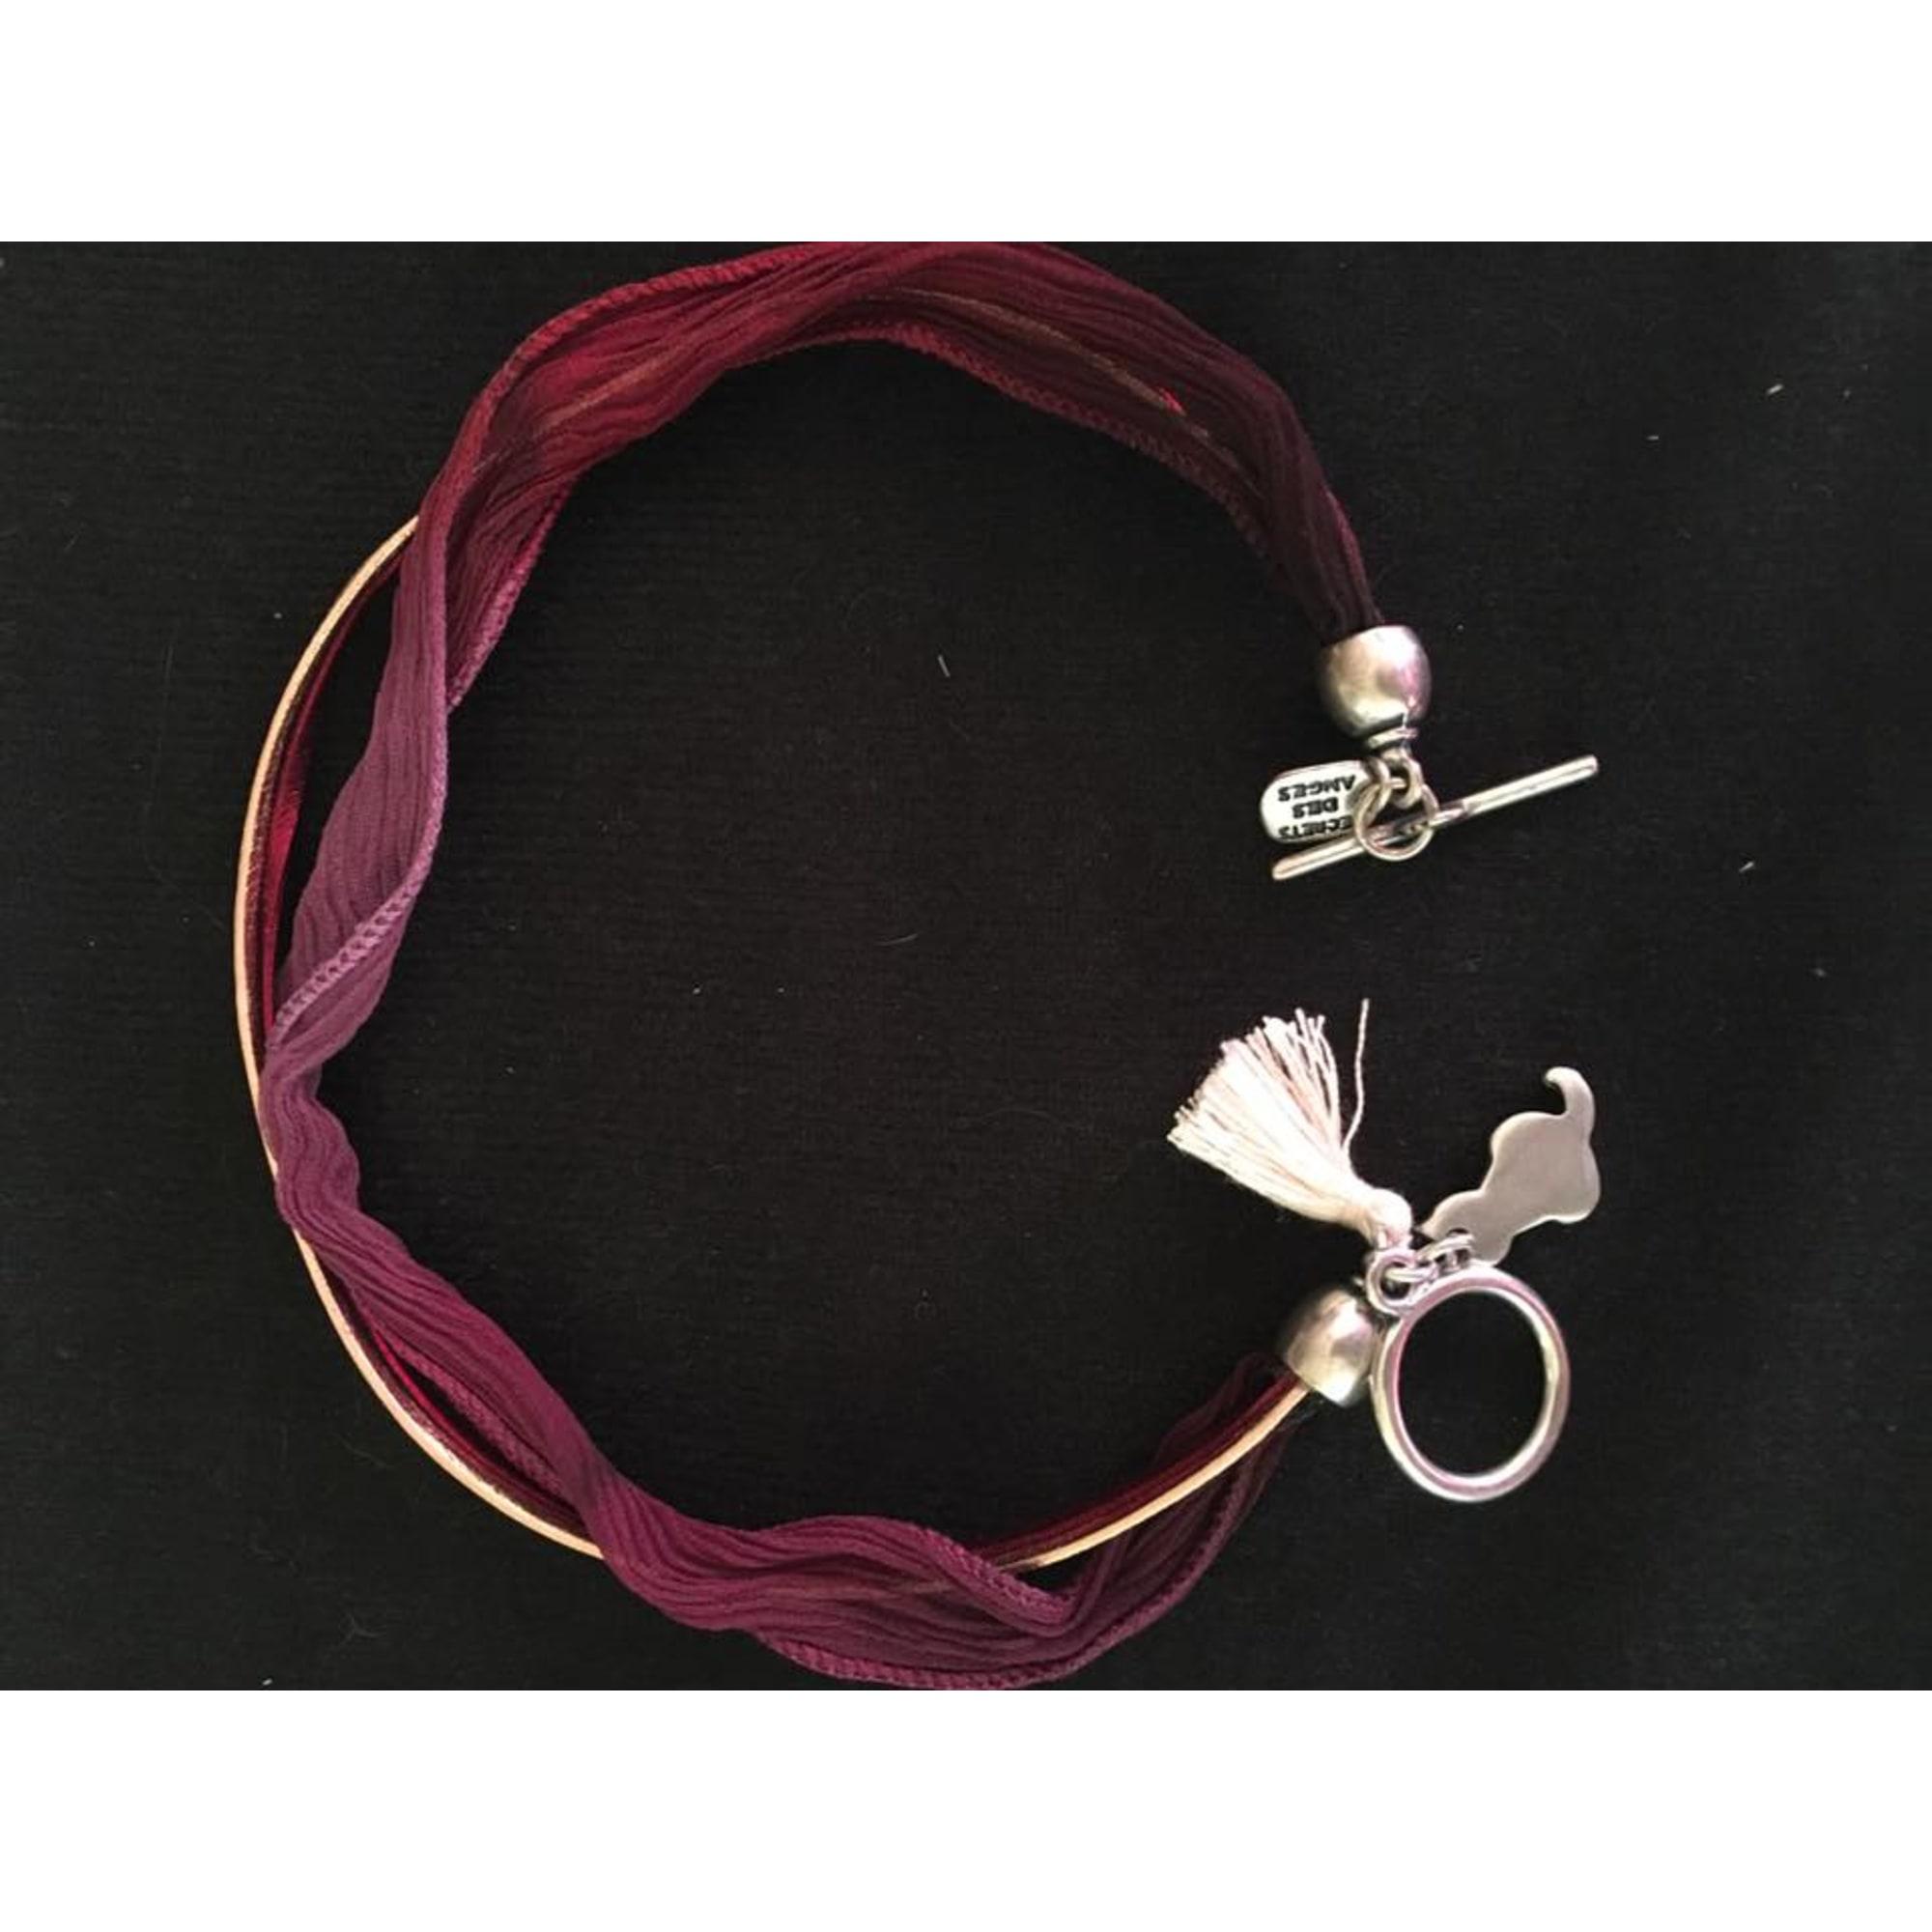 Bracelet SECRETS DES ANGES tissu et cuir rouge